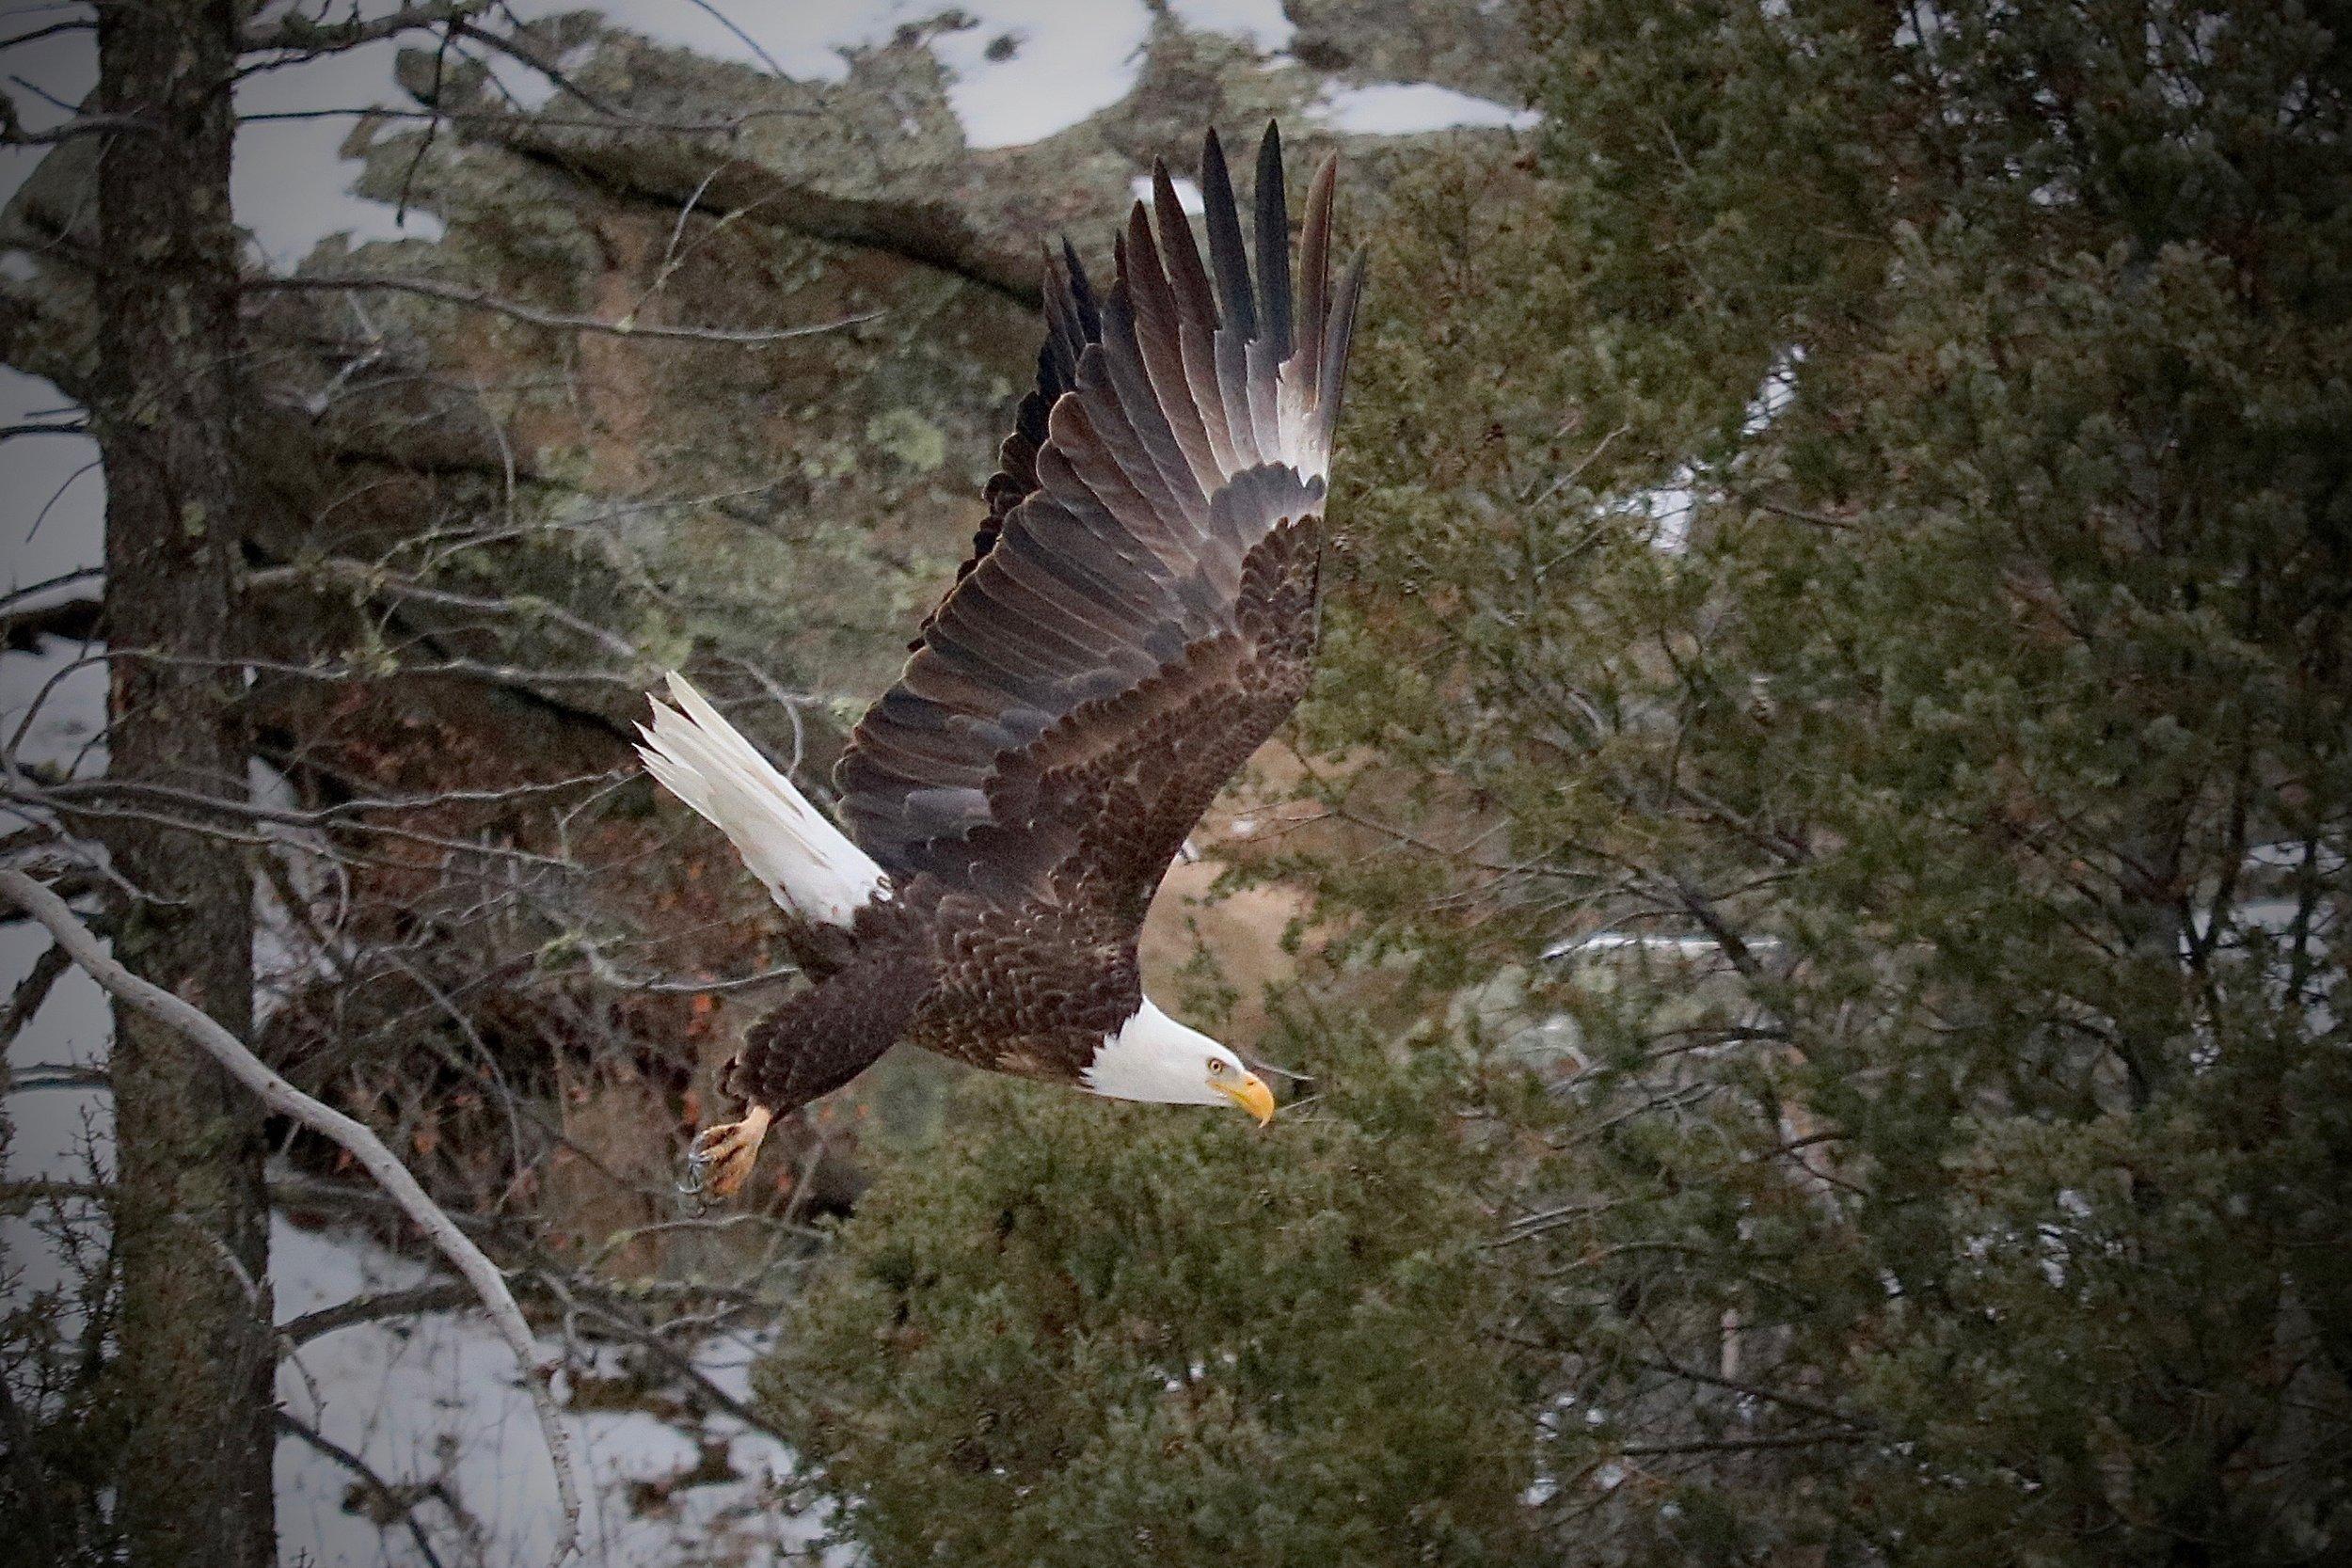 American Bald Eagle, Elevenmile Canyon, South Platte River, Colorado, USA.